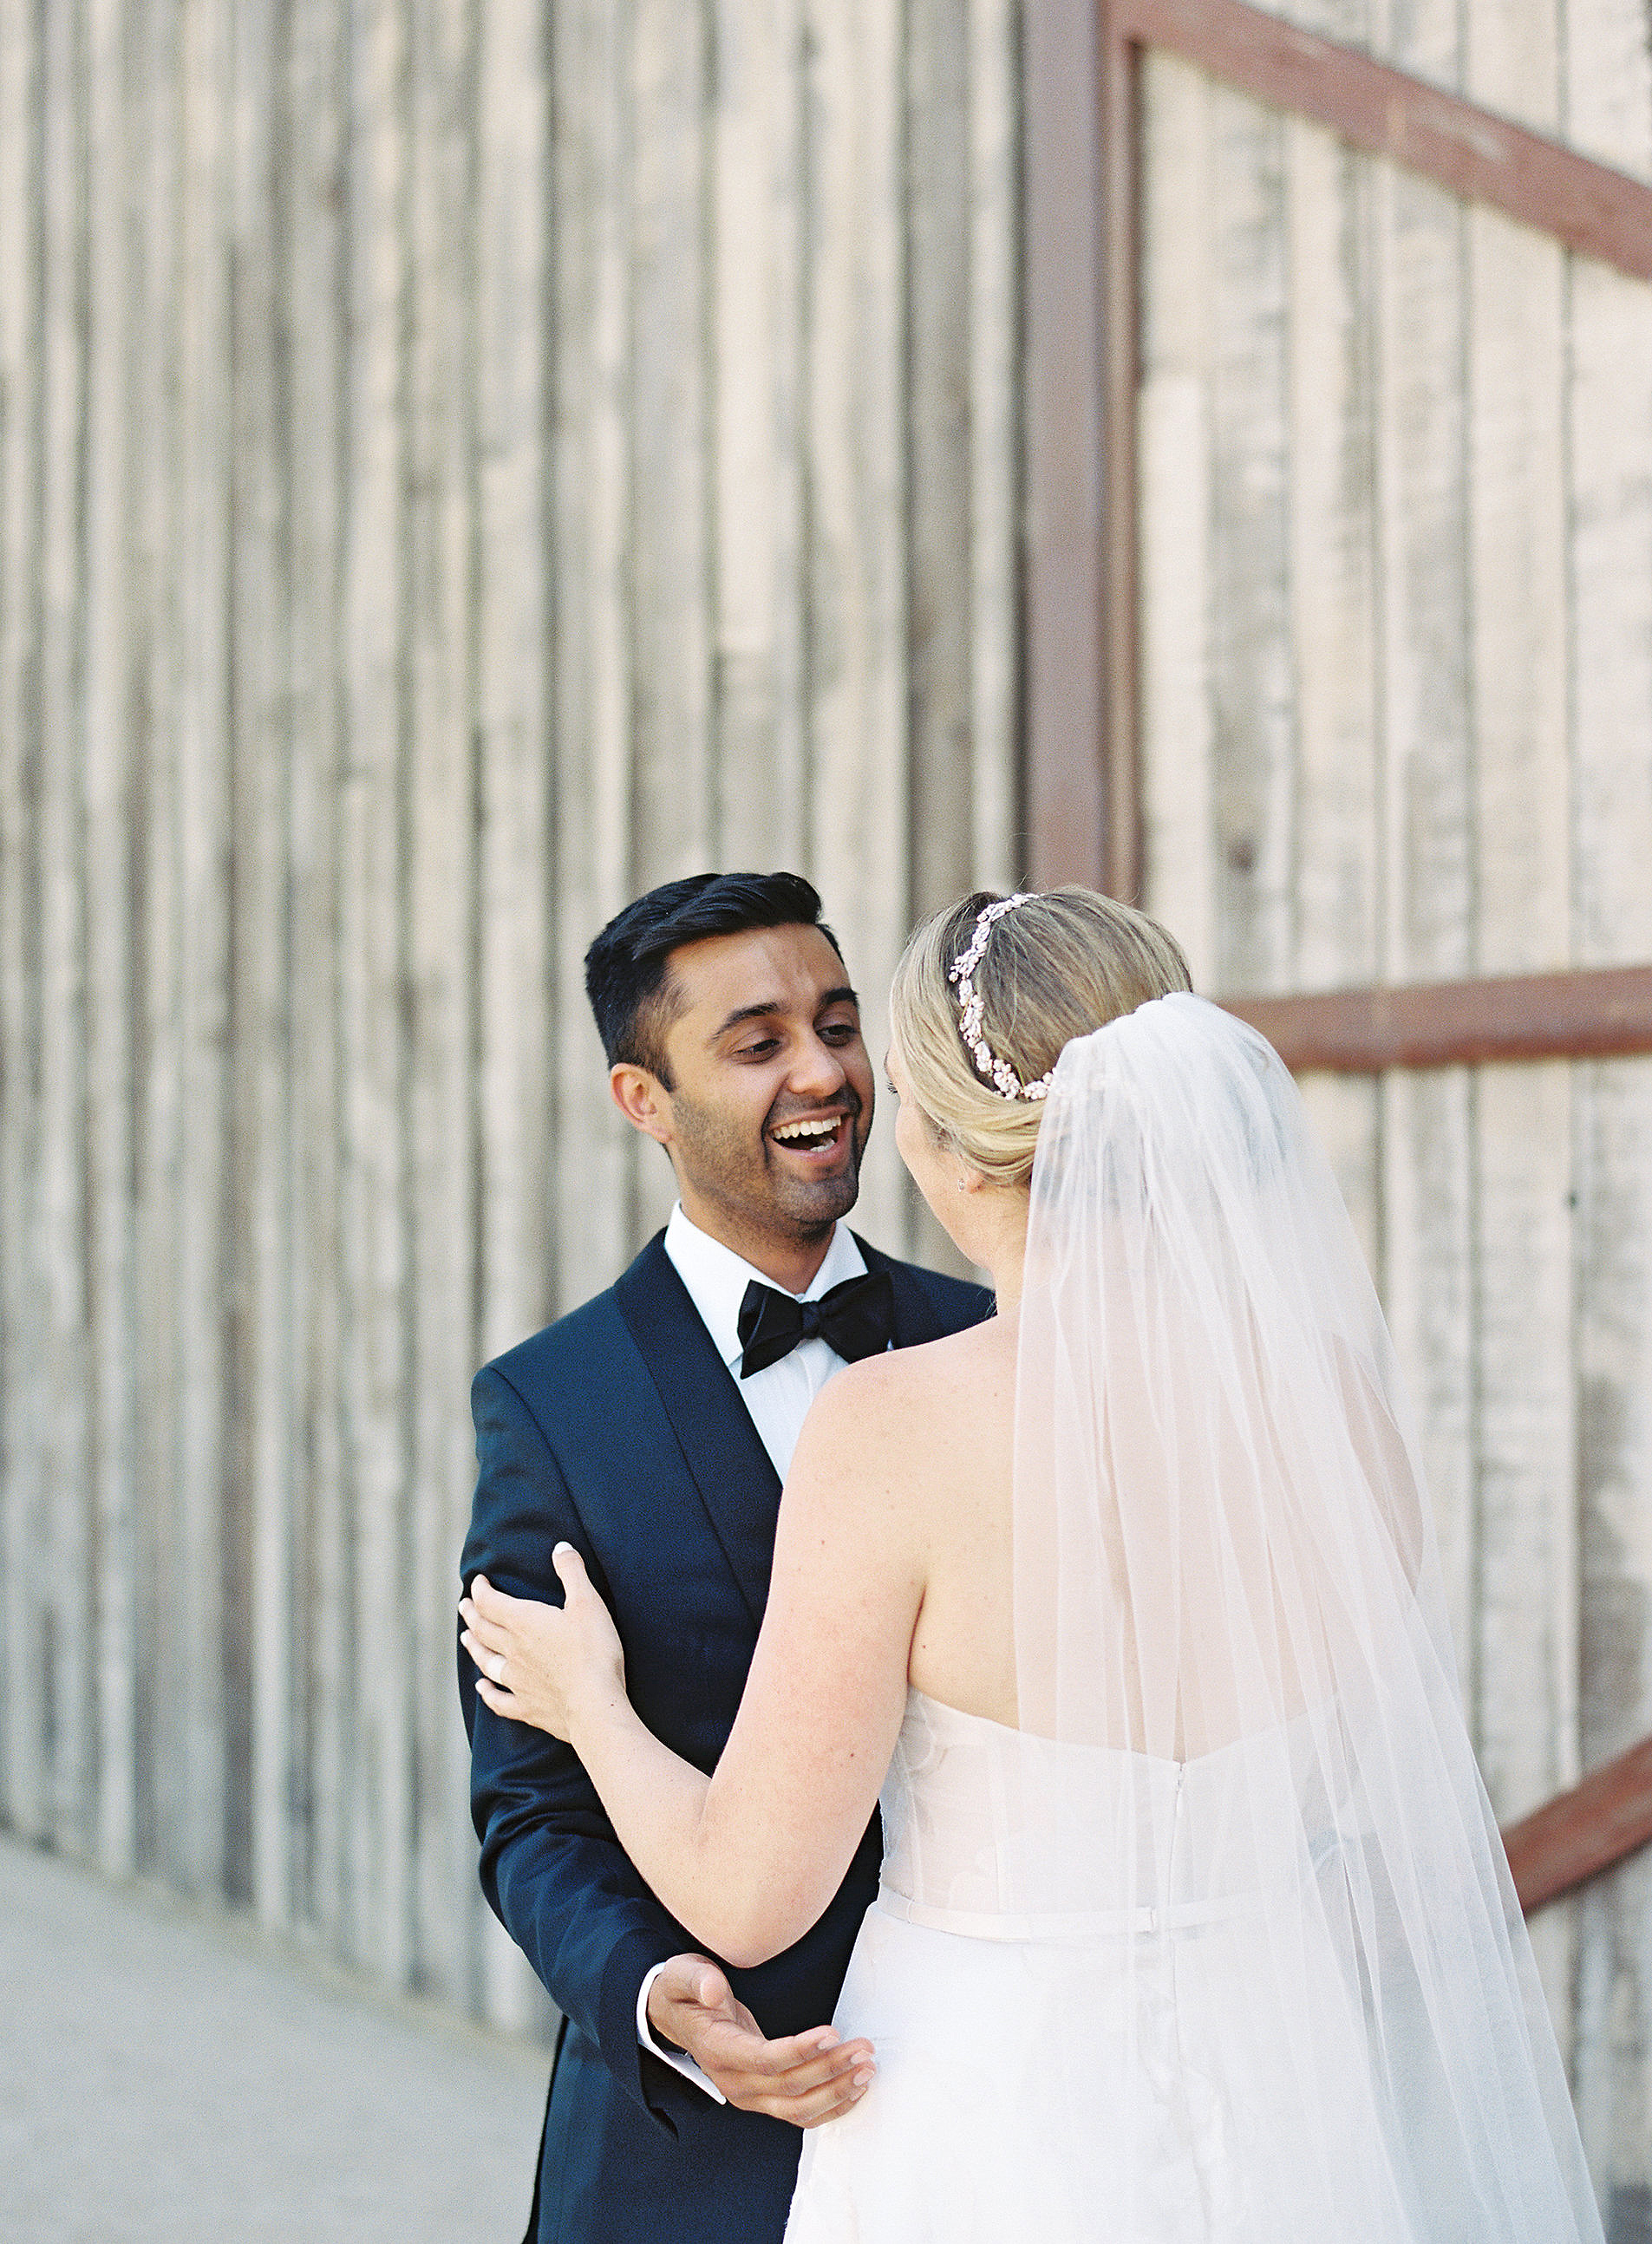 emily siddartha wedding firstlook bride groom